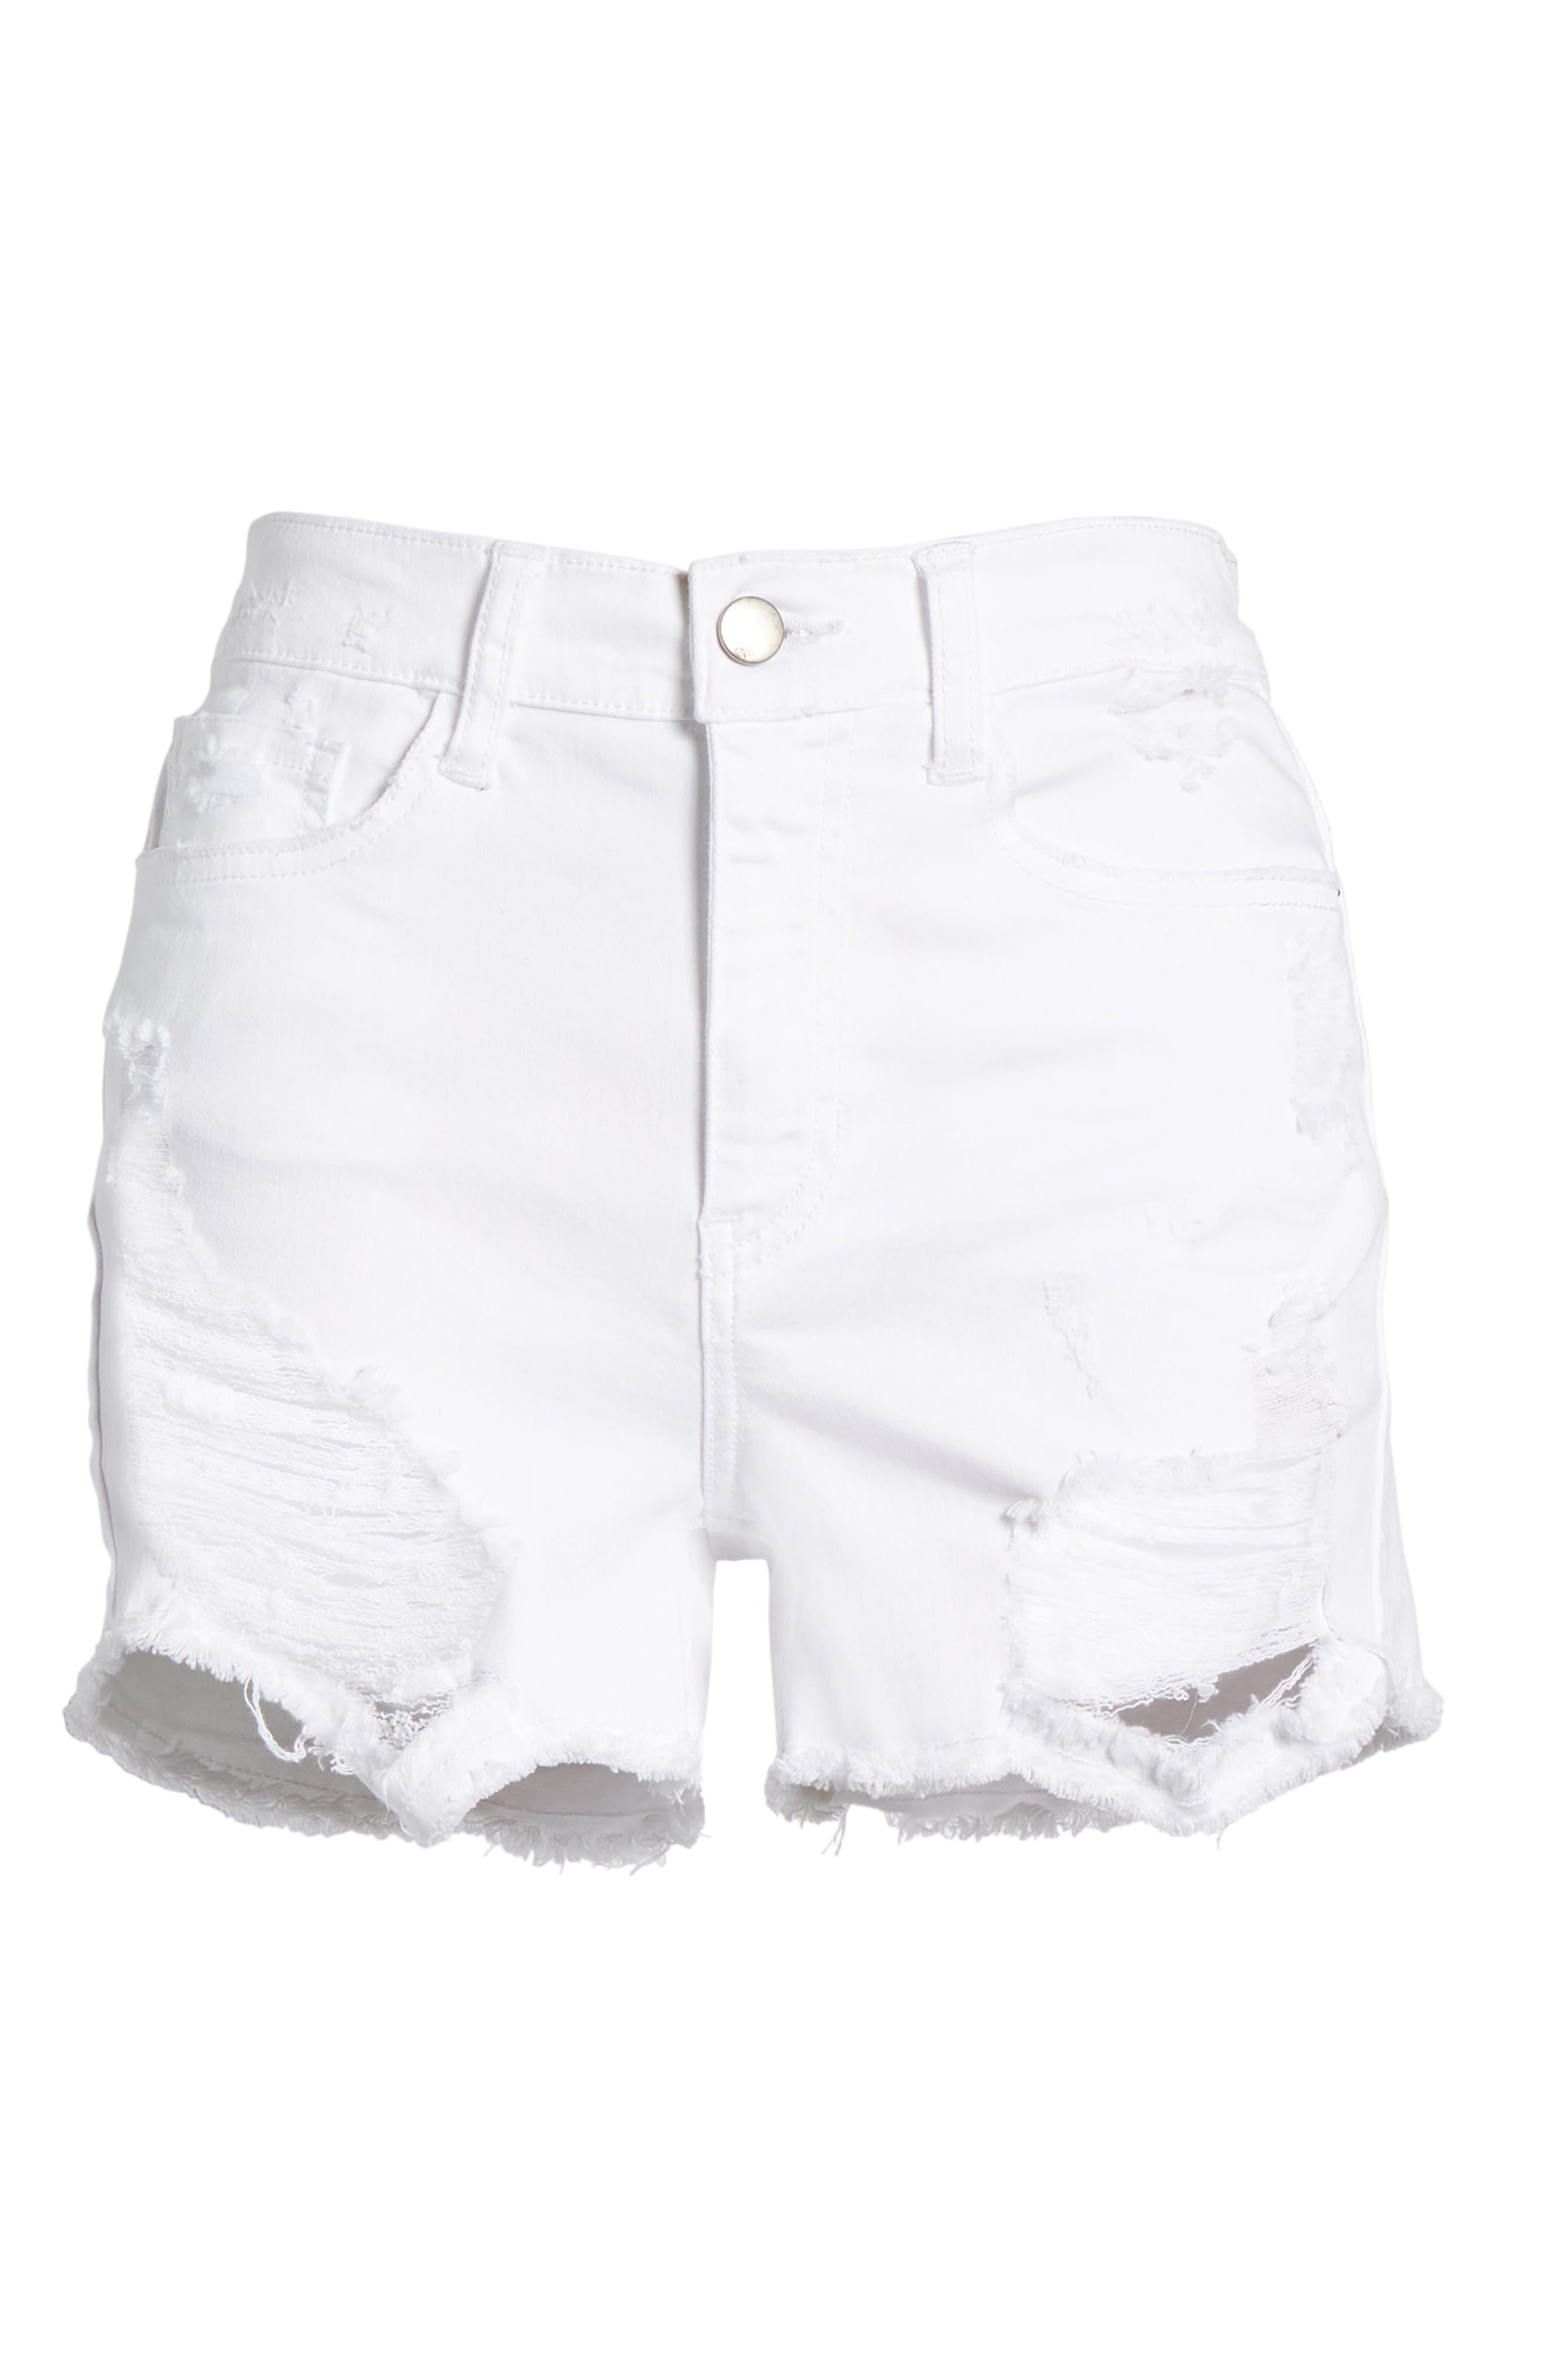 Ripped Cutoff Shorts,                             Alternate thumbnail 7, color,                             White